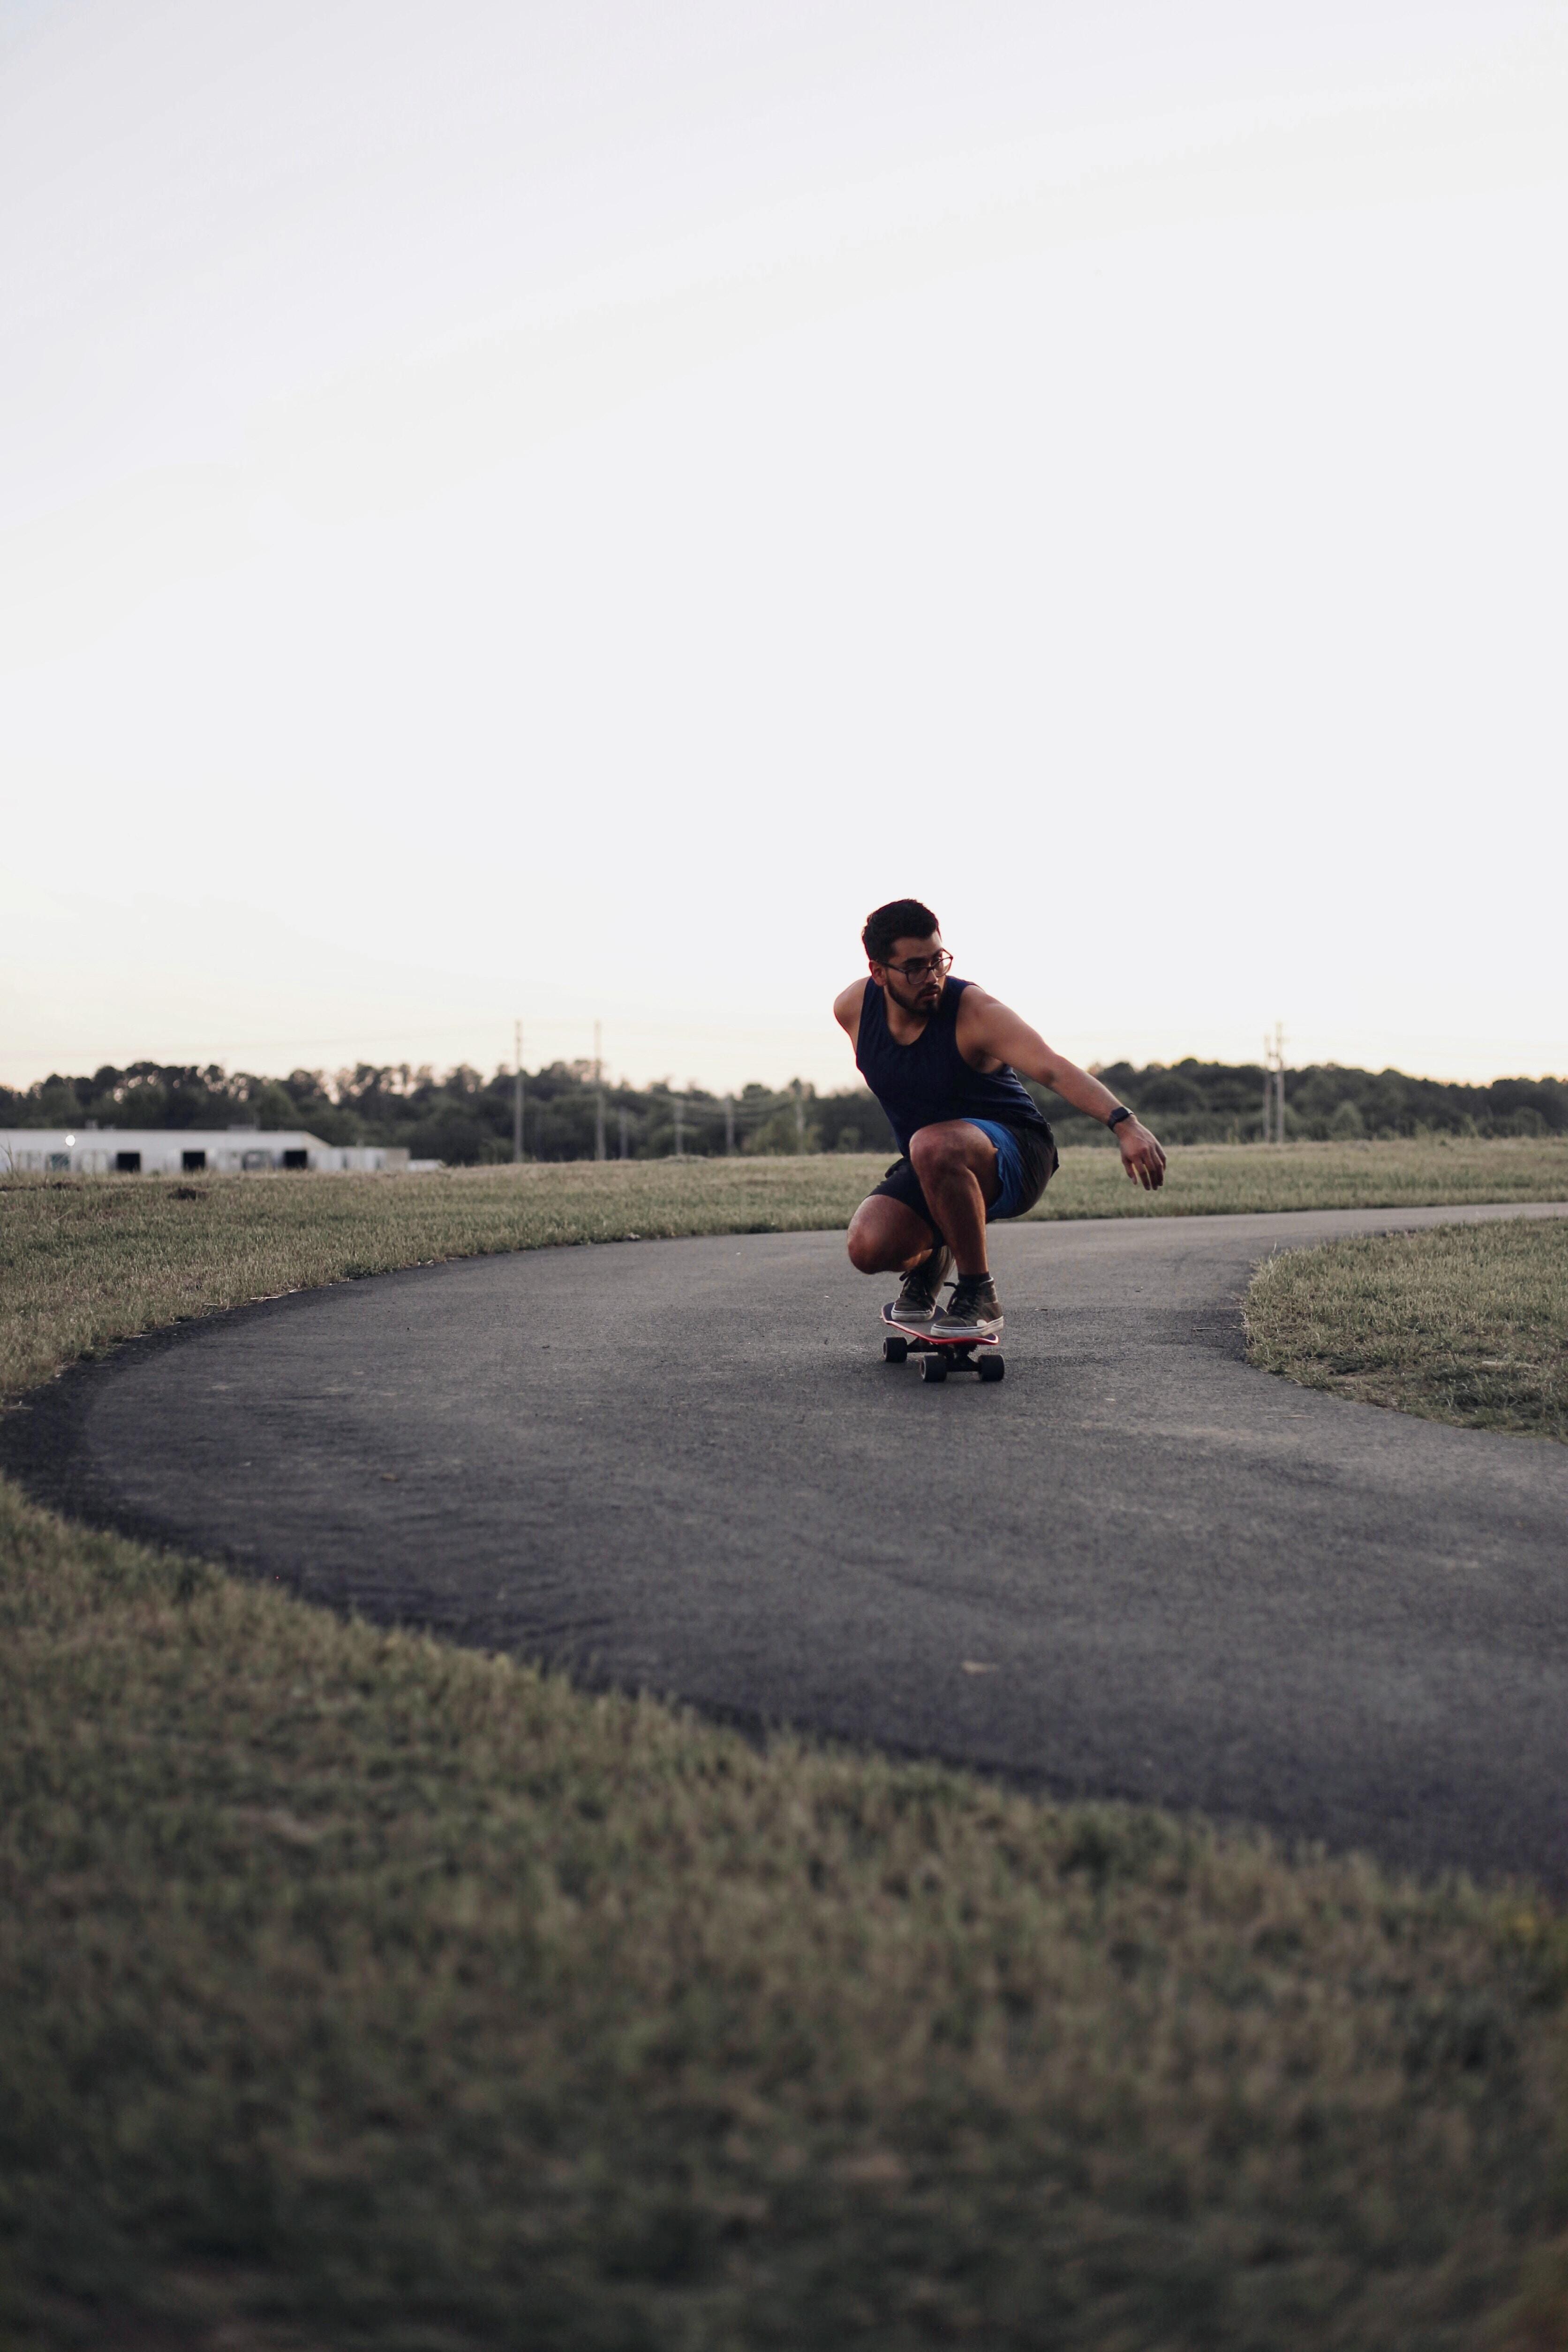 Long board free ride cruiser board